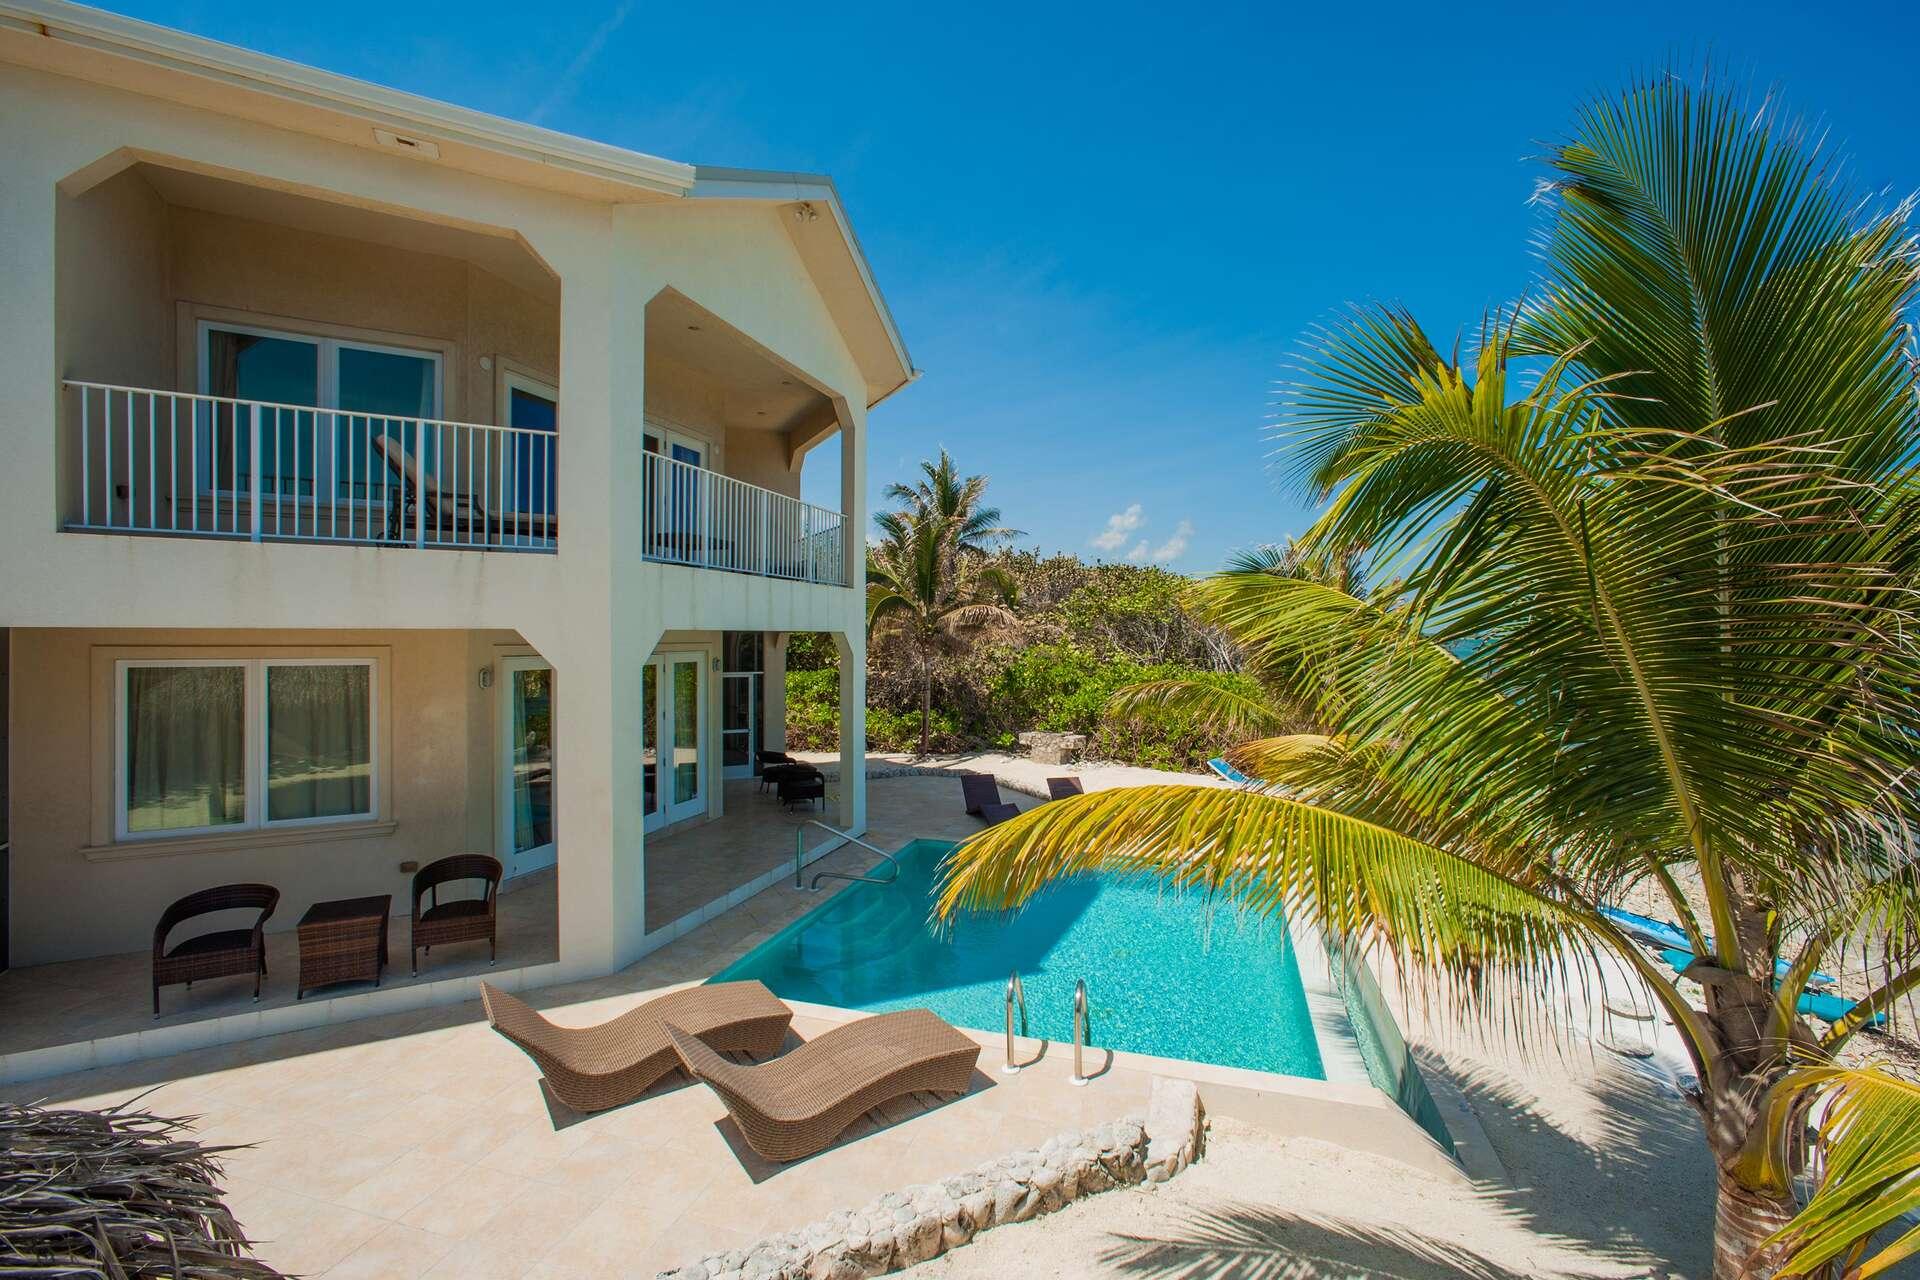 Luxury villa rentals caribbean - Cayman islands - Grand cayman - Old man bay - Christmas Palms - Image 1/22